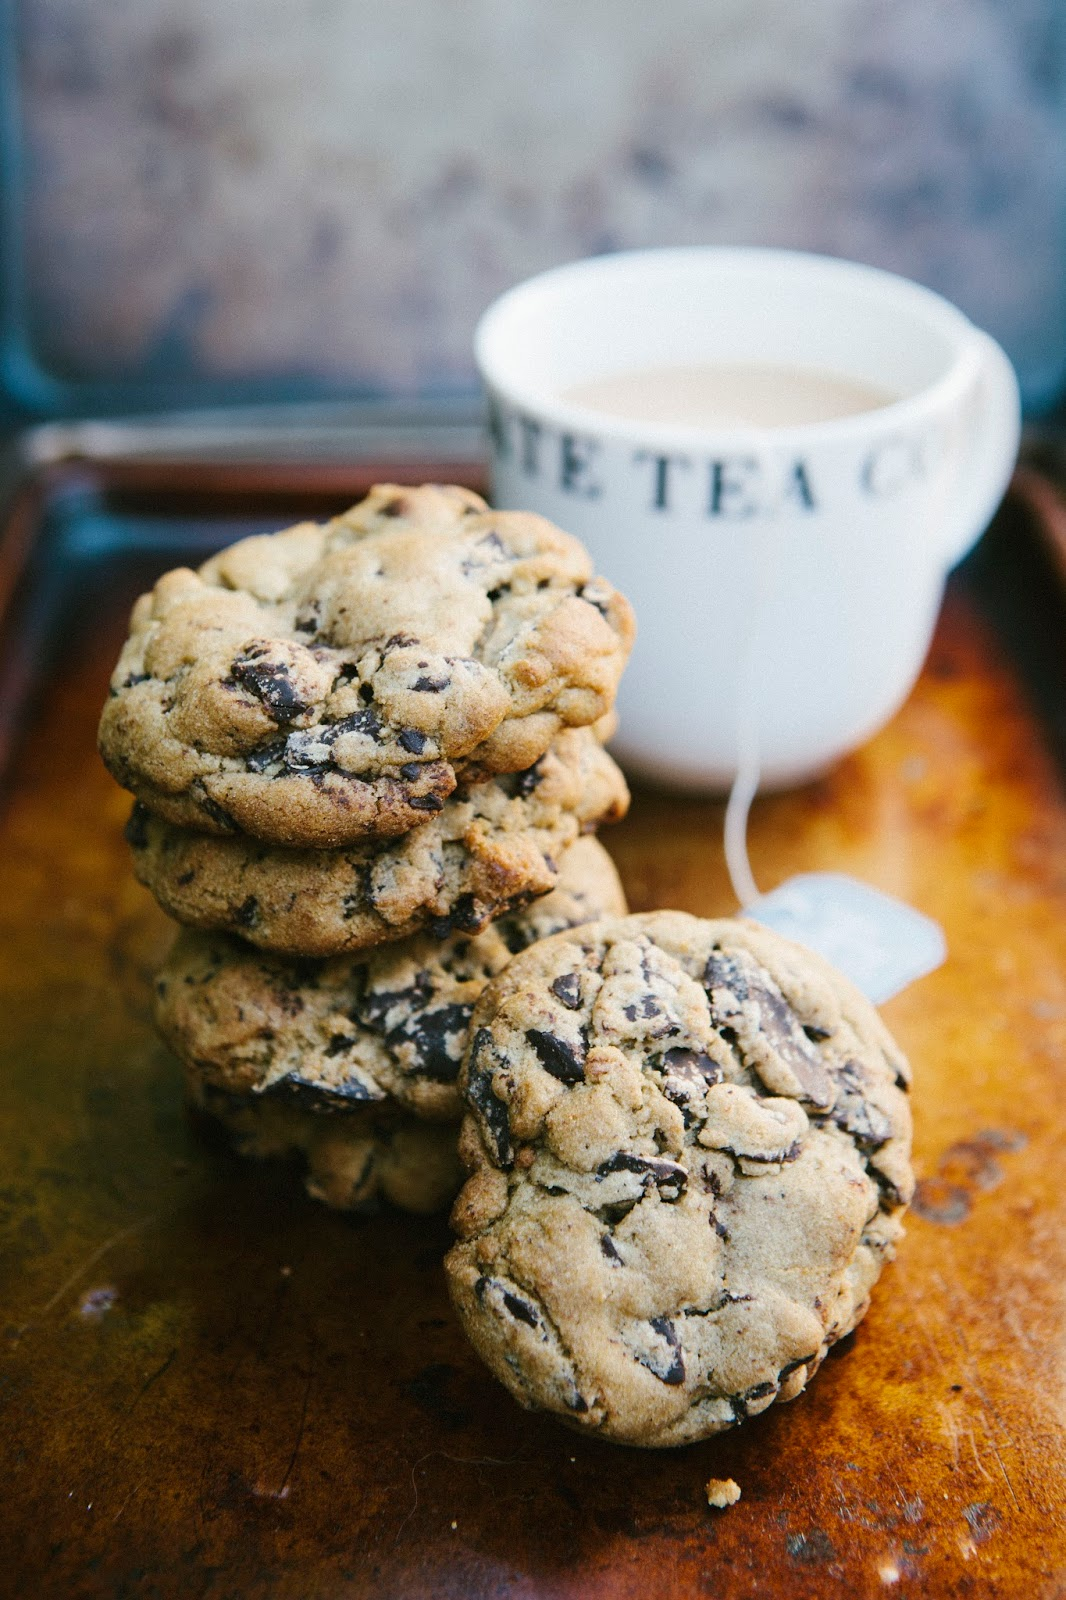 ... Food Blog in San Francisco: Dark Chocolate and Earl Grey Tea Cookies